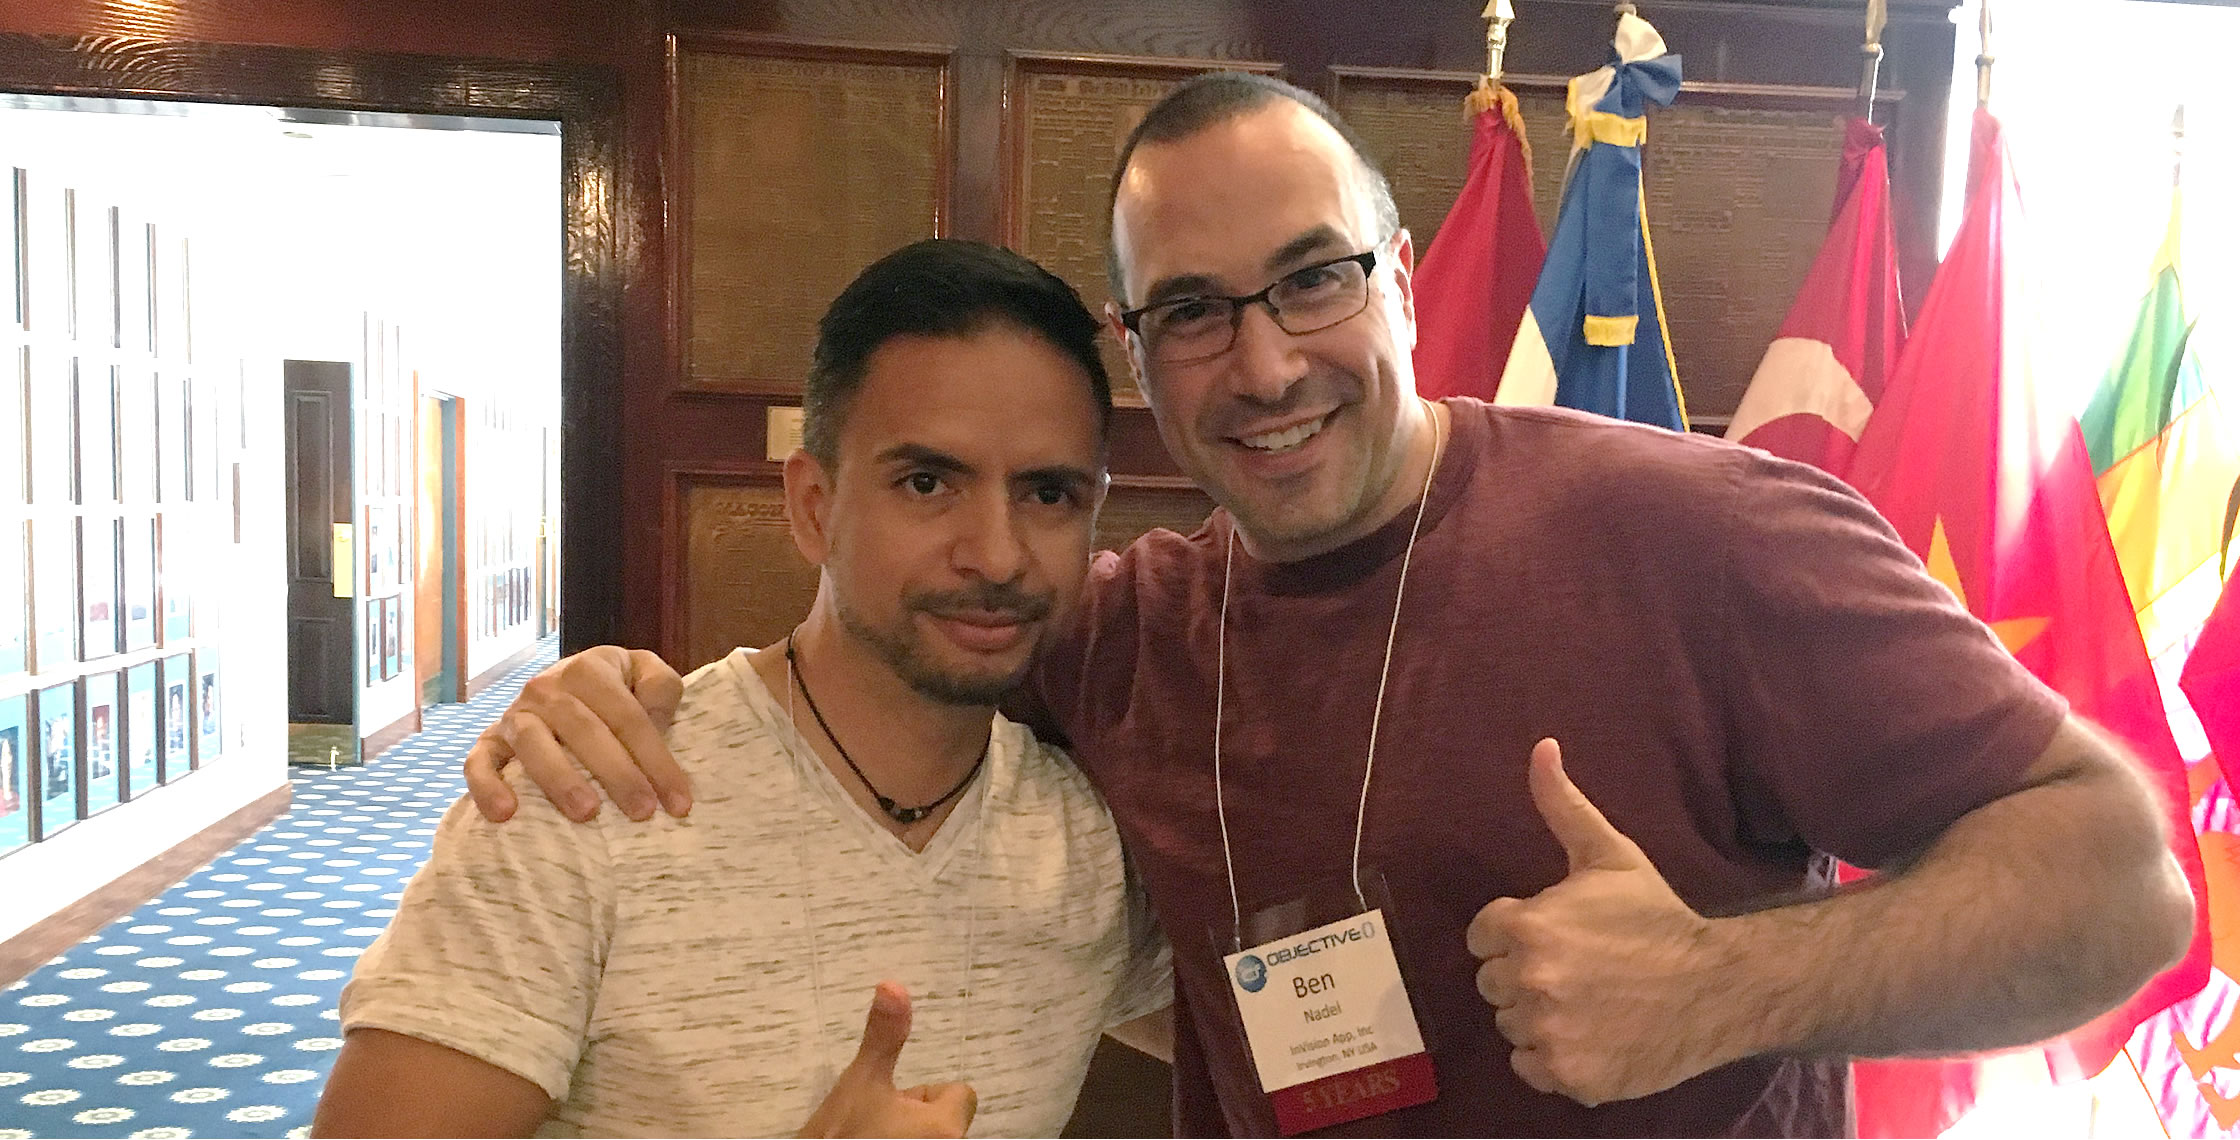 Ben Nadel at cf.Objective() 2017 (Washington, D.C.) with: Raul Delgado